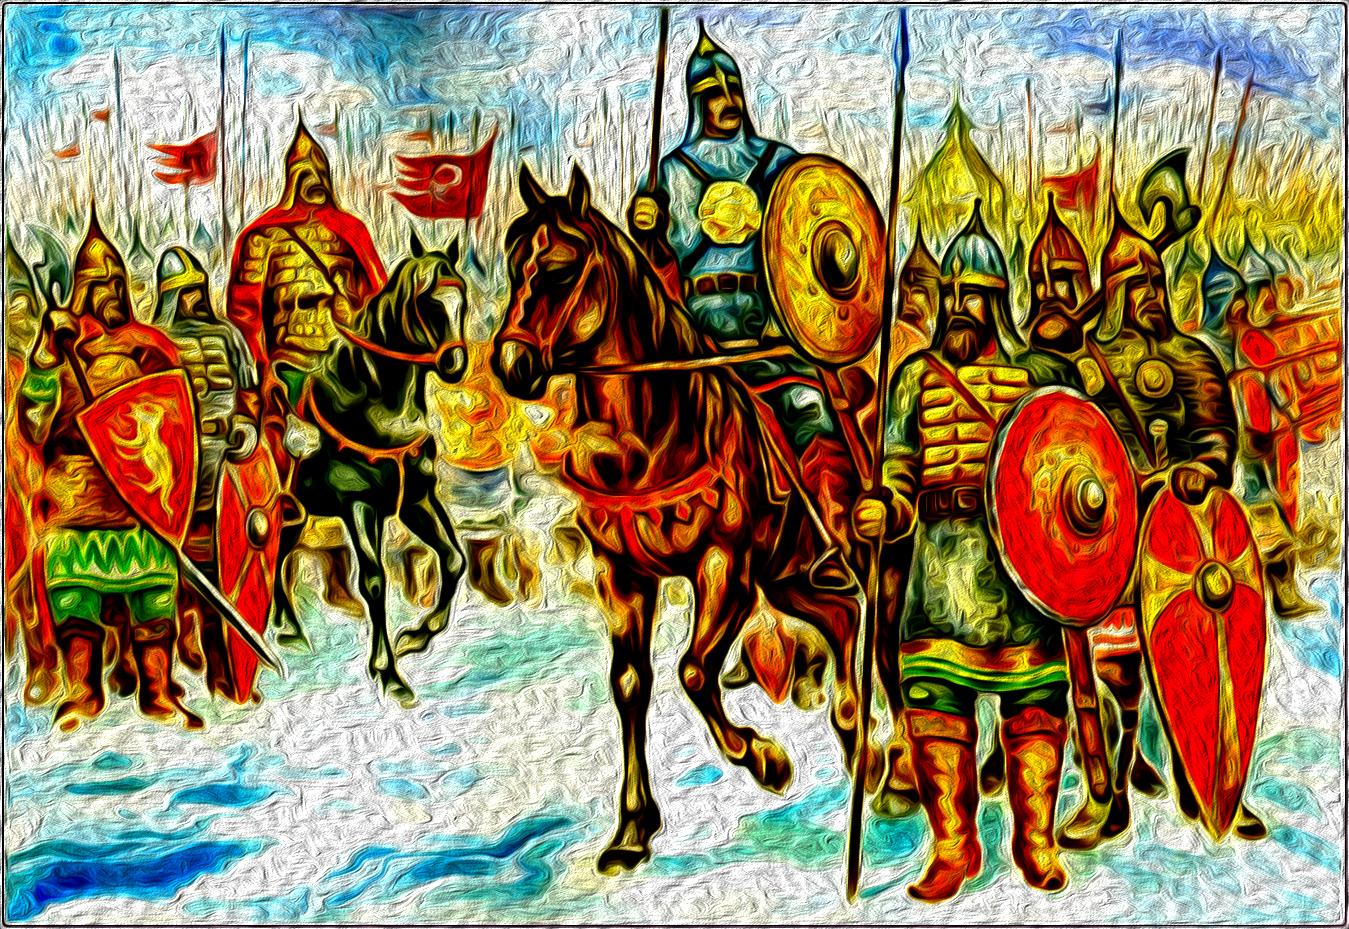 Мстислав Великий. Разгар усобиц